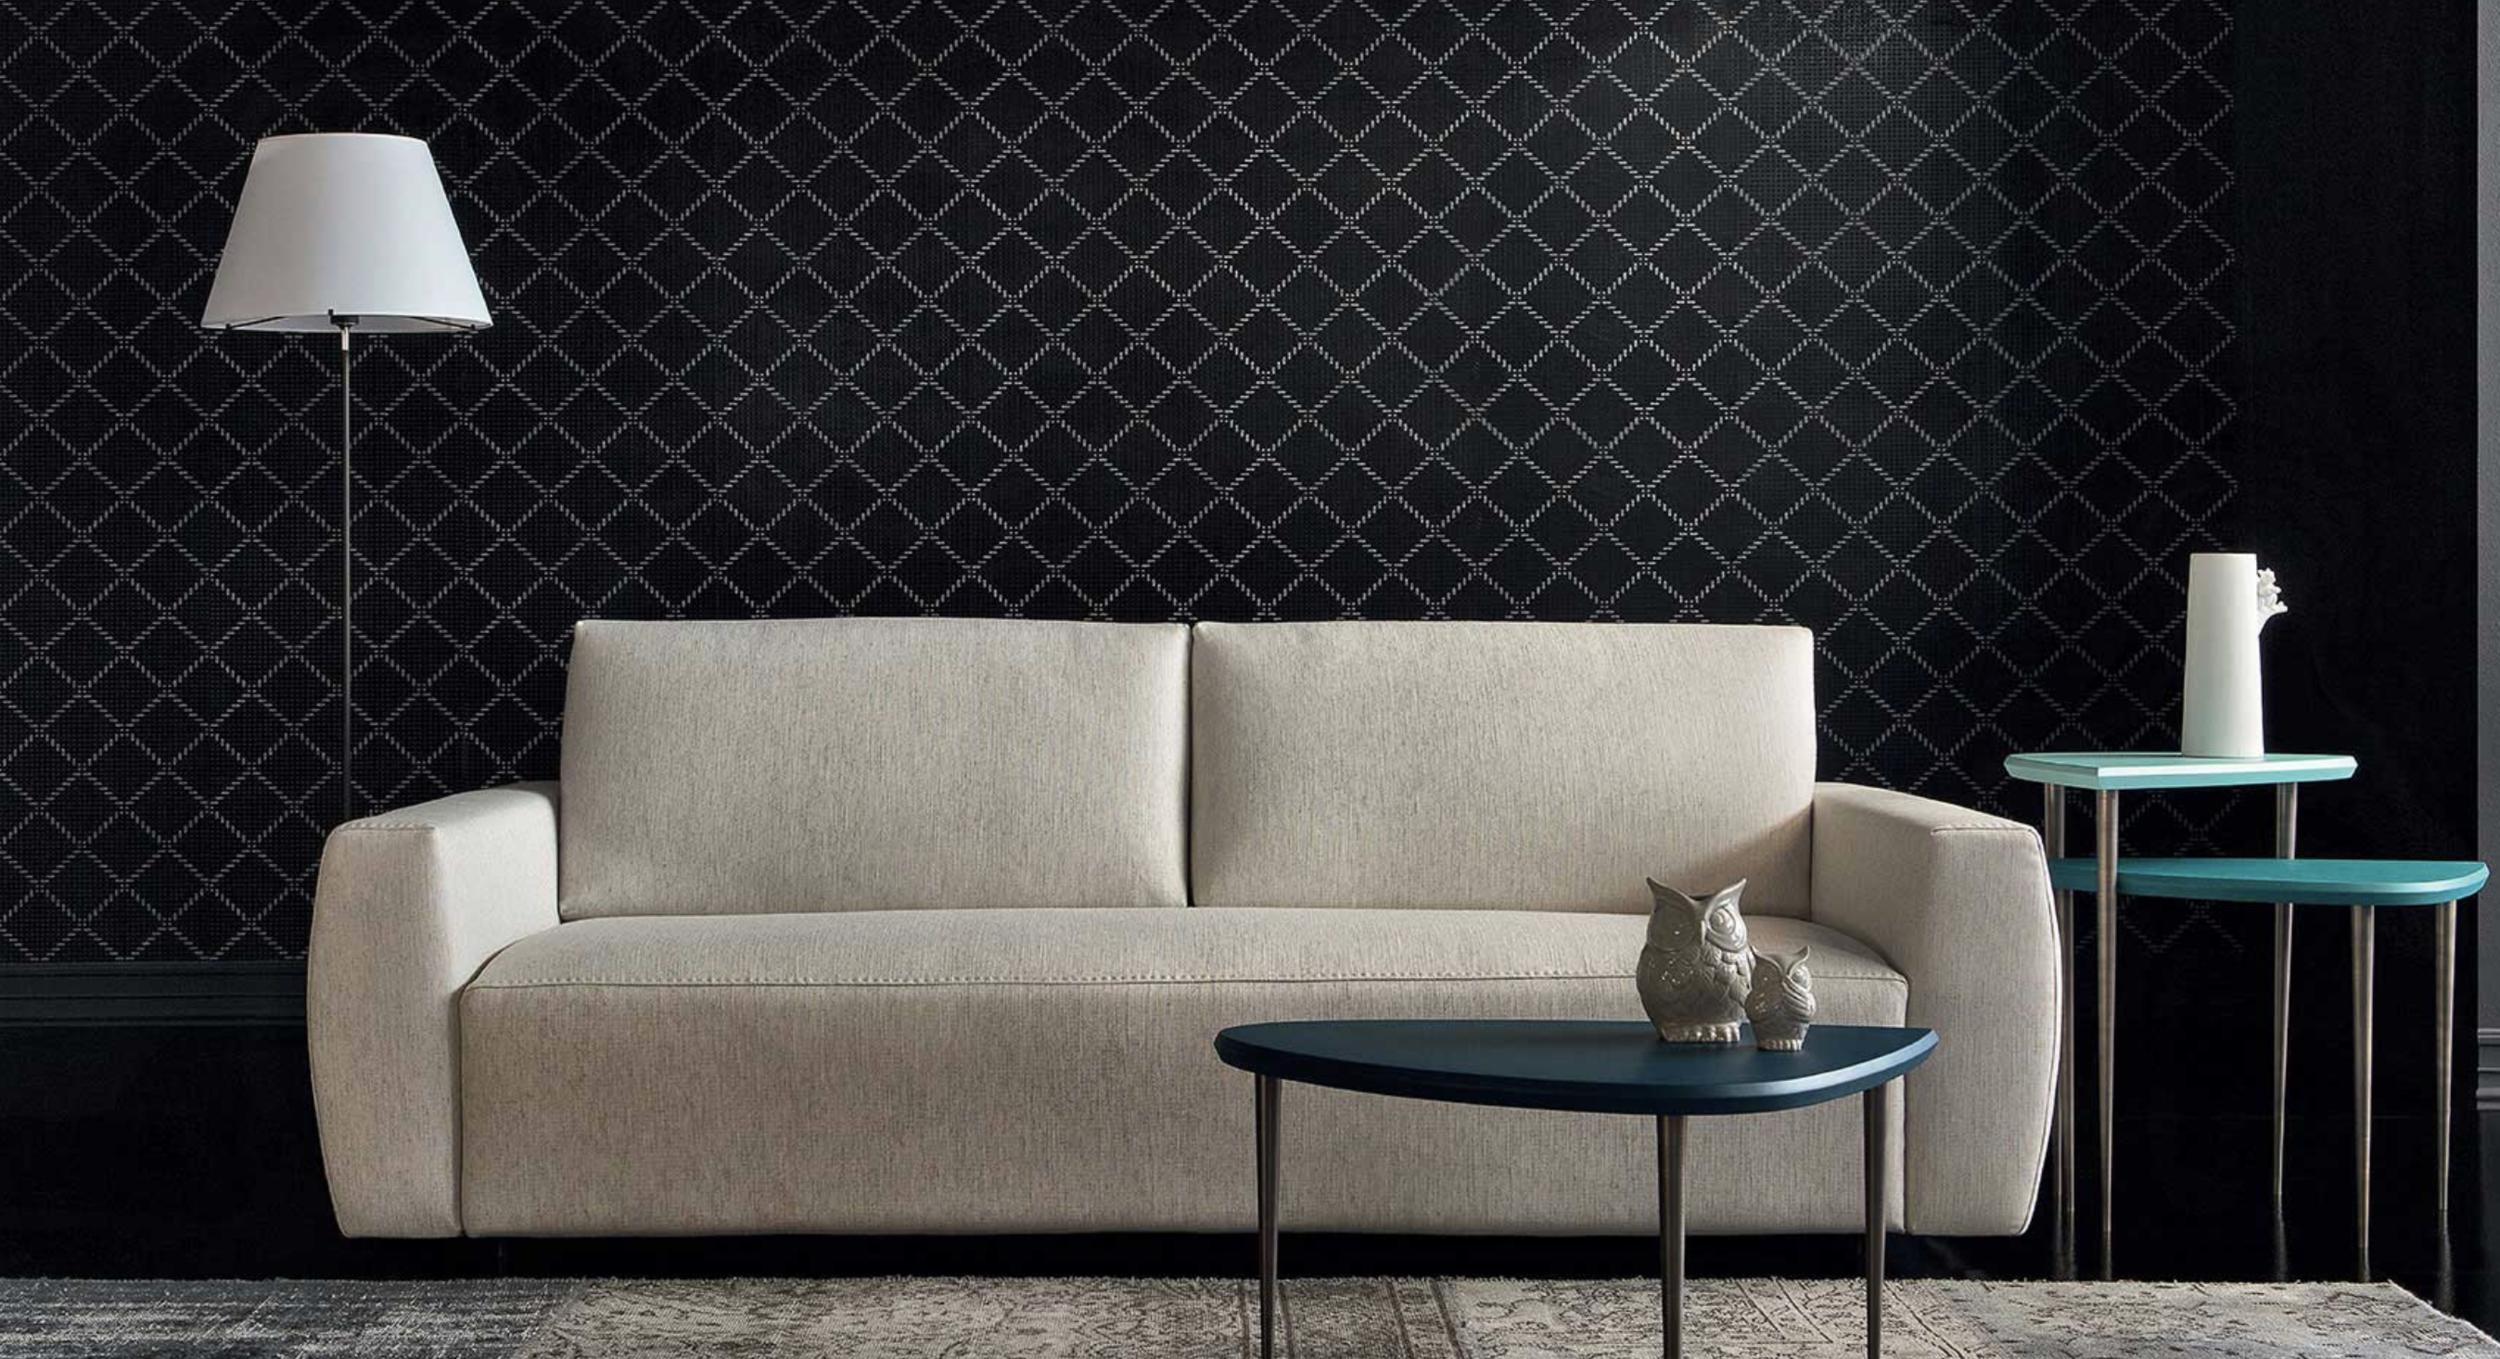 Tremendous Pin By Designitalia On Modern Sofa Beds Sectional Sofas Uwap Interior Chair Design Uwaporg